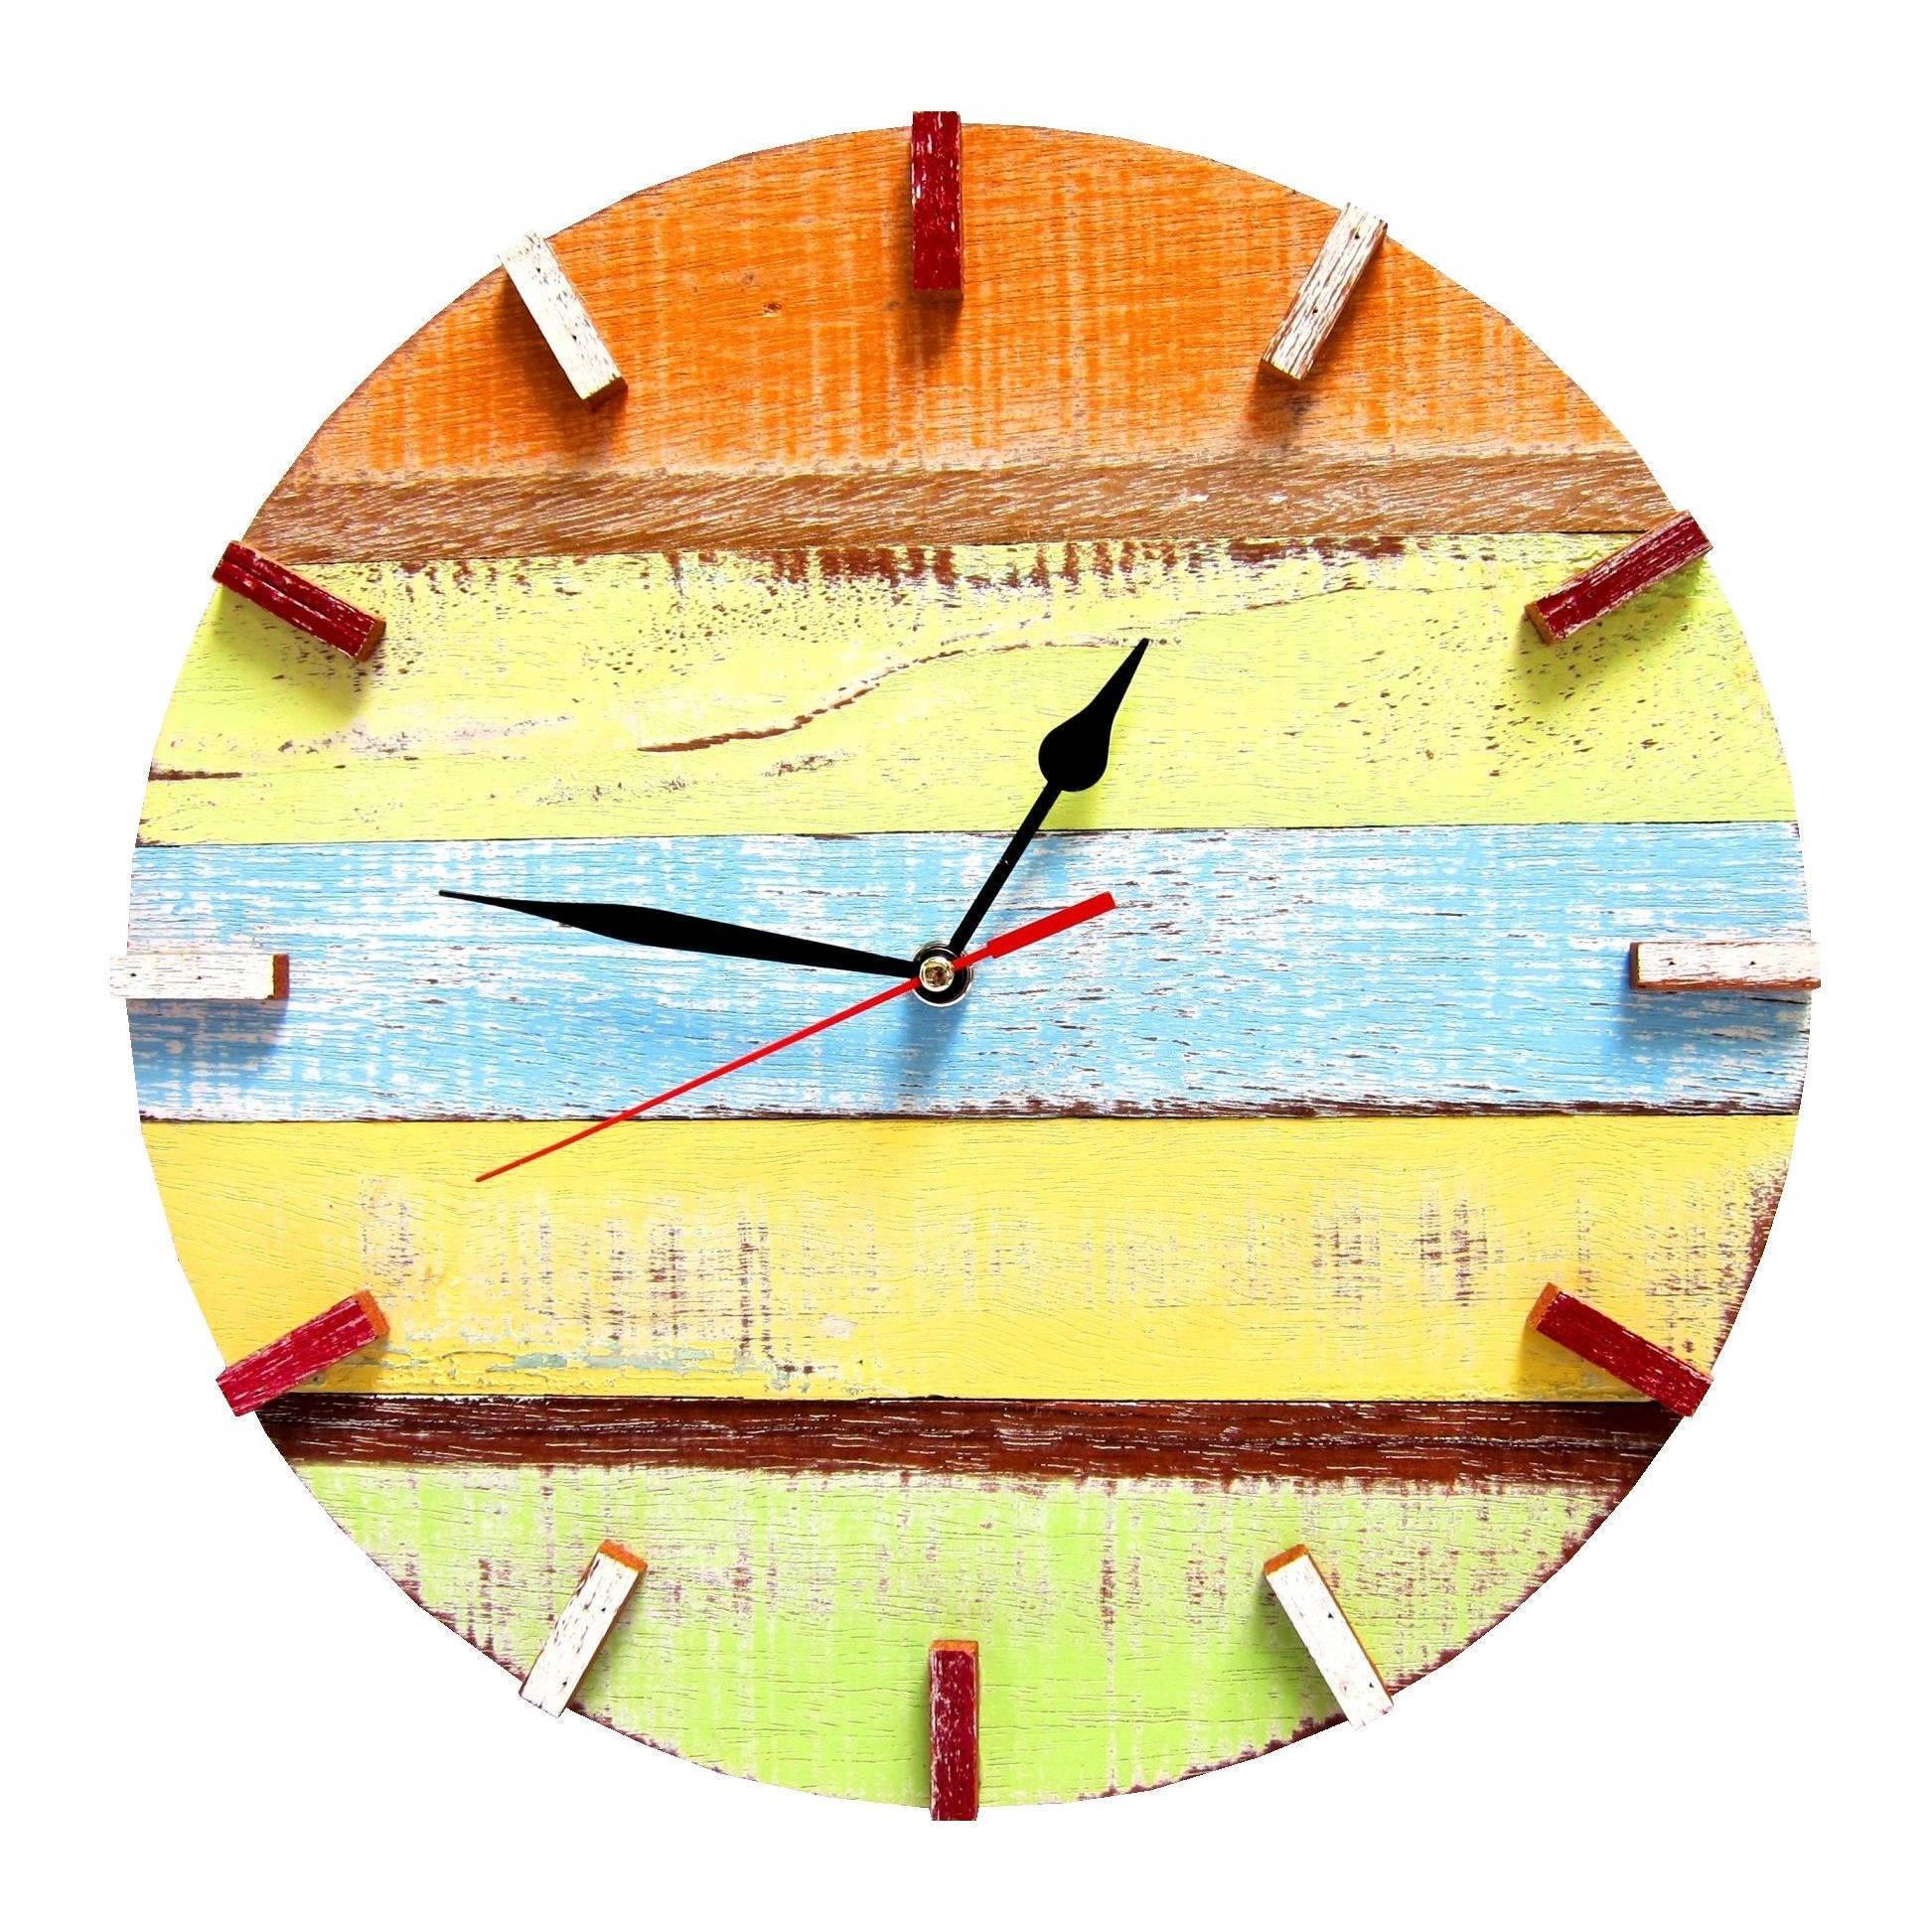 Handmade Recycled Boat Wood Beach House Clock (Thailand) - Free ...